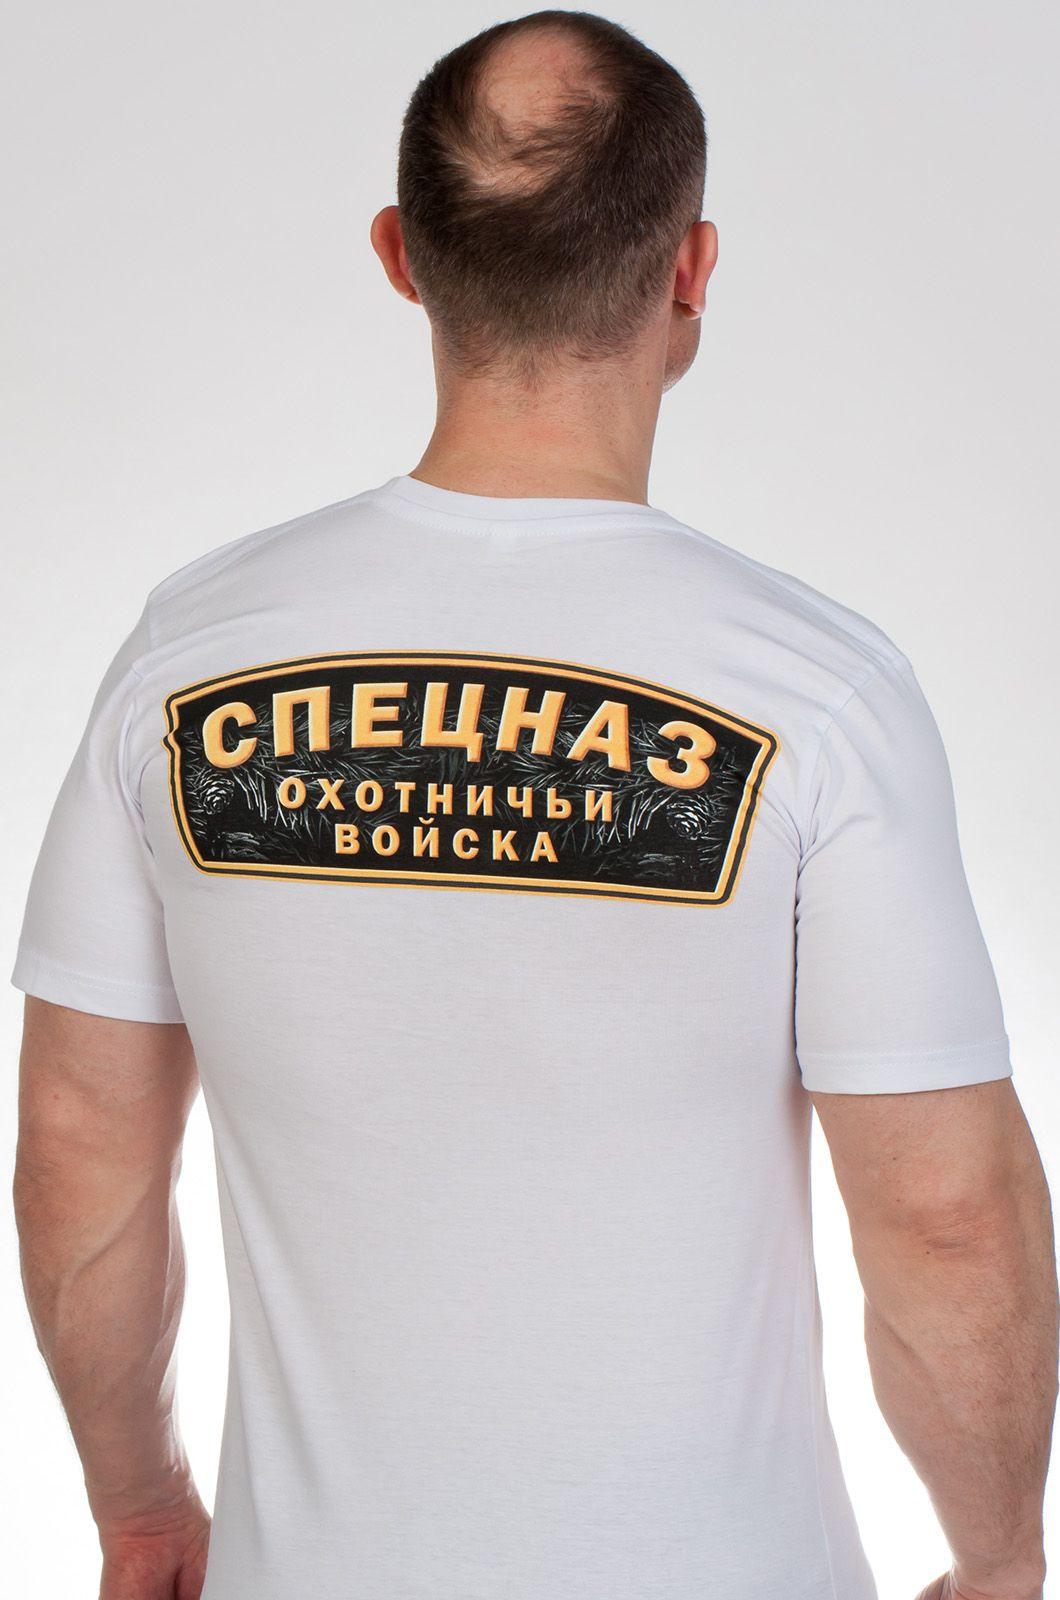 Белая футболка с медведем - вид сзади